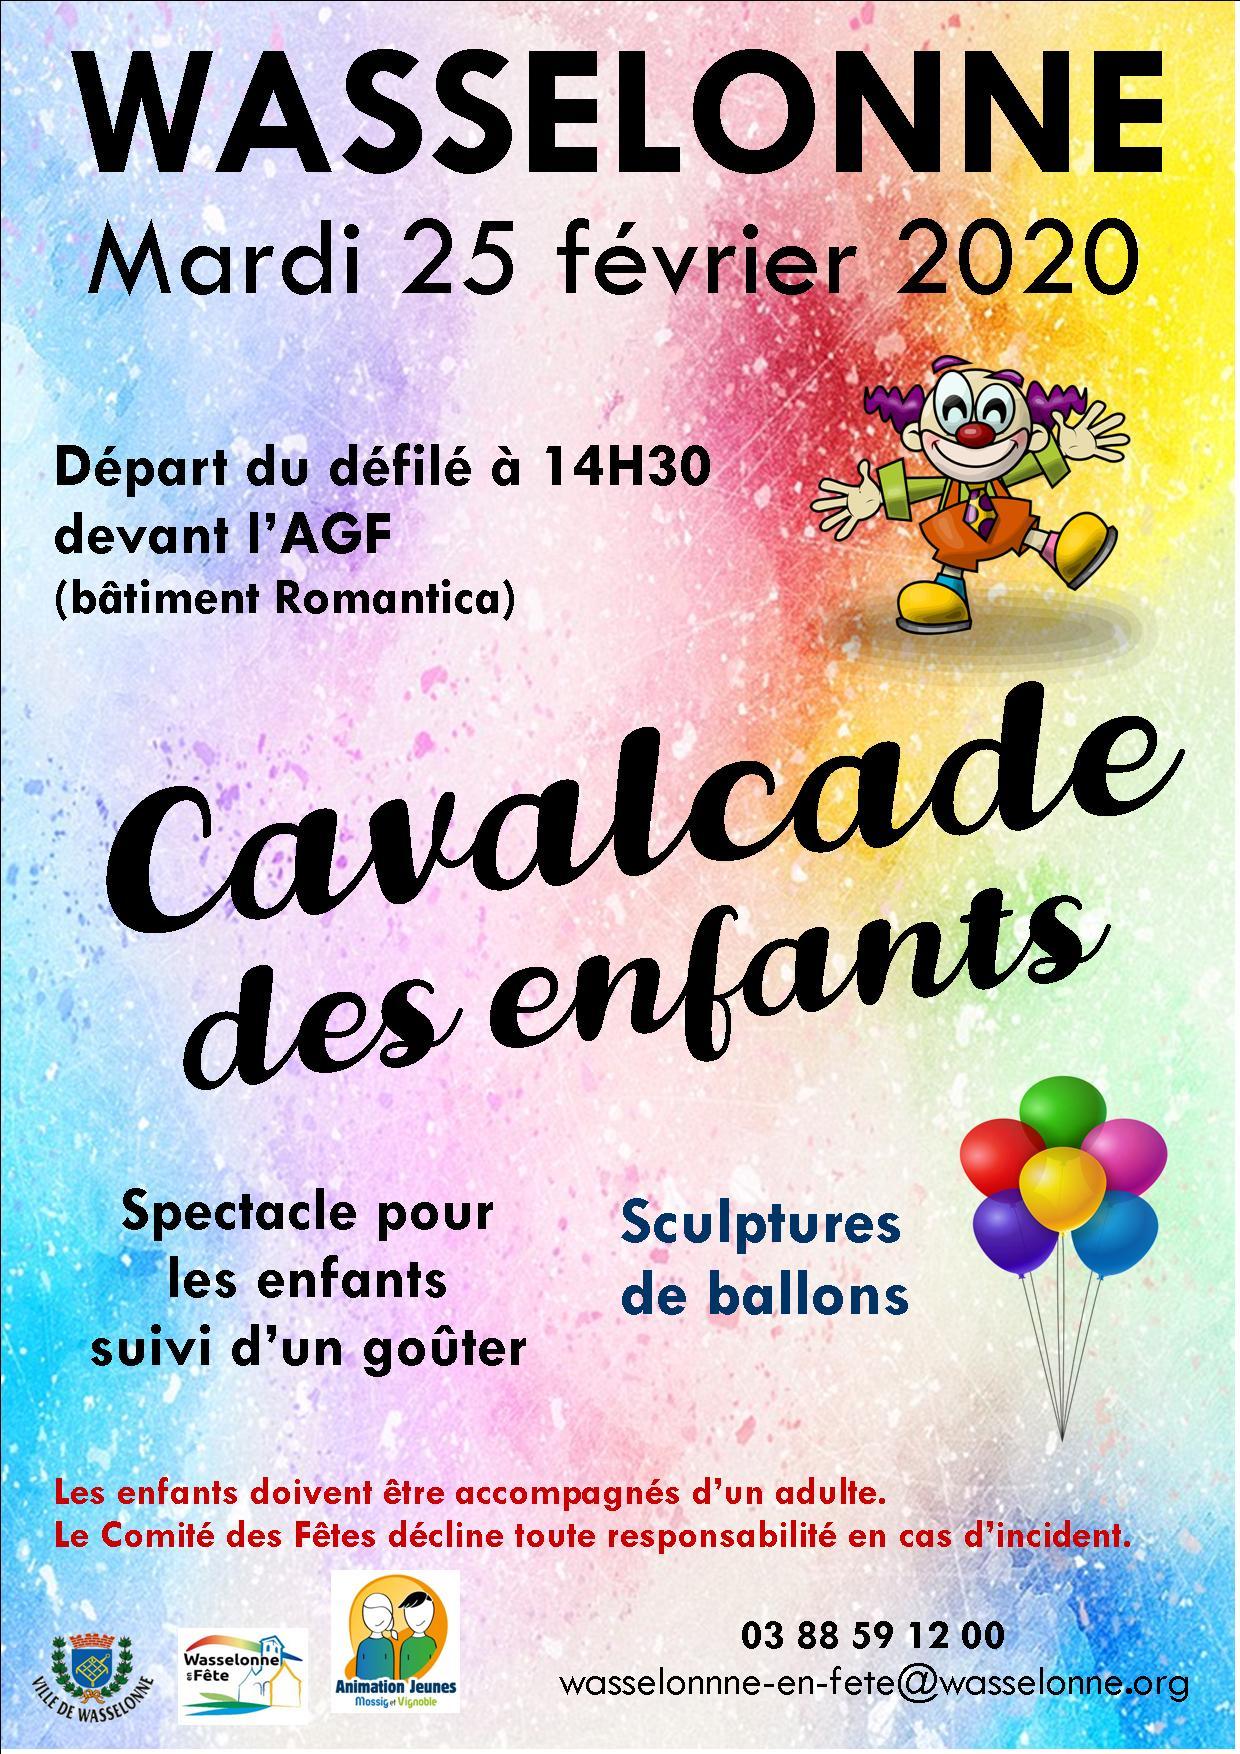 Cavalcade des Enfants 2020 Wasselonne